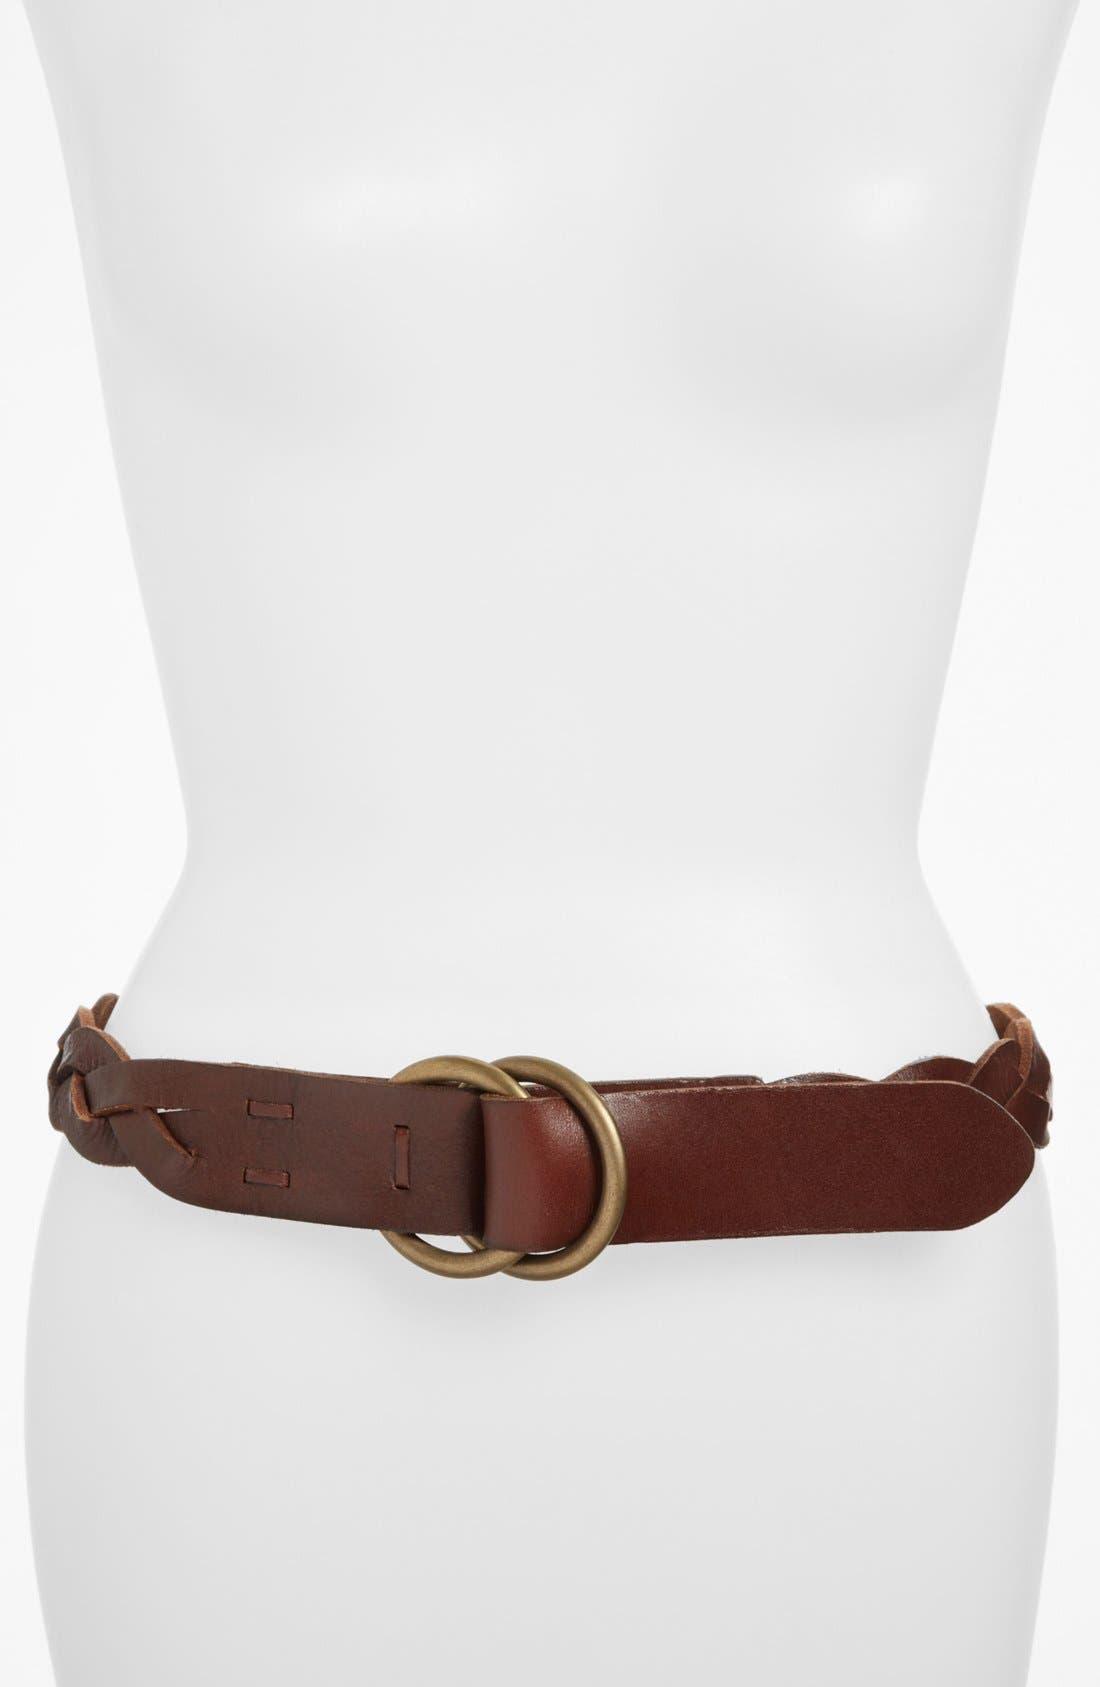 Alternate Image 1 Selected - Lauren Ralph Lauren 'Miracle Braid' Leather Belt